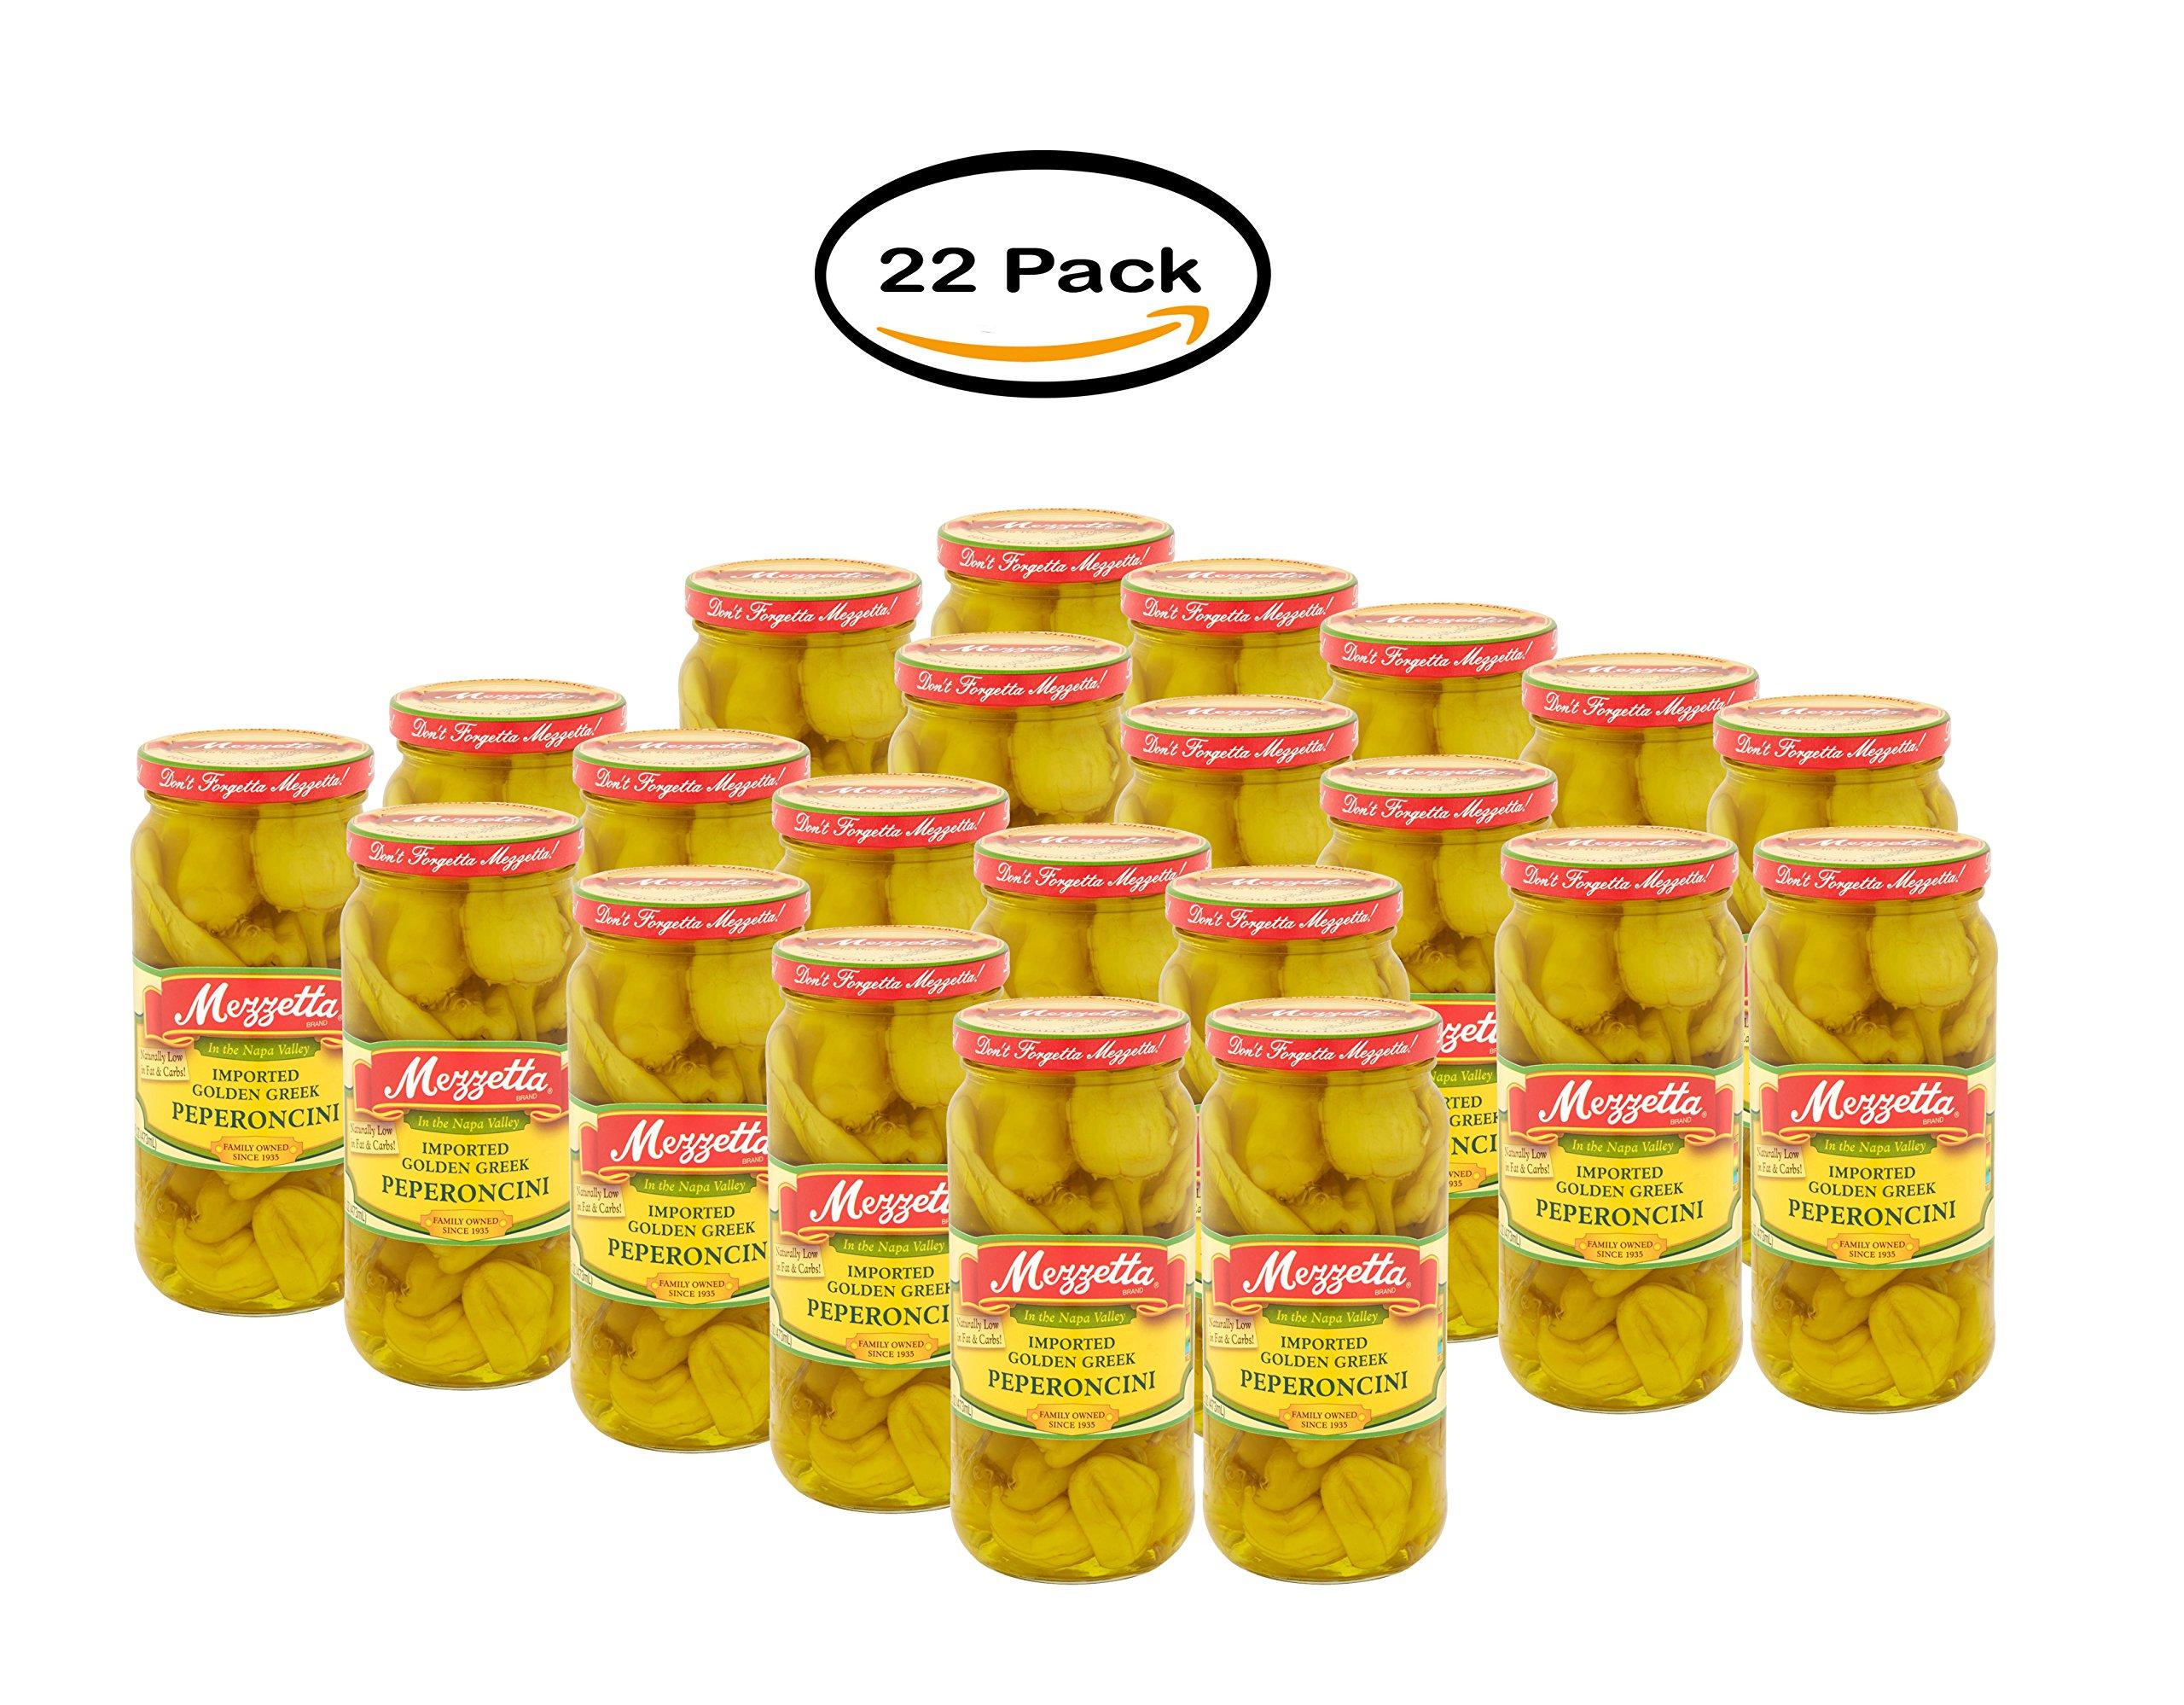 PACK OF 22 - Mezzetta Imported Greek Golden Pepperoncini, 16 fl oz by Mezzetta